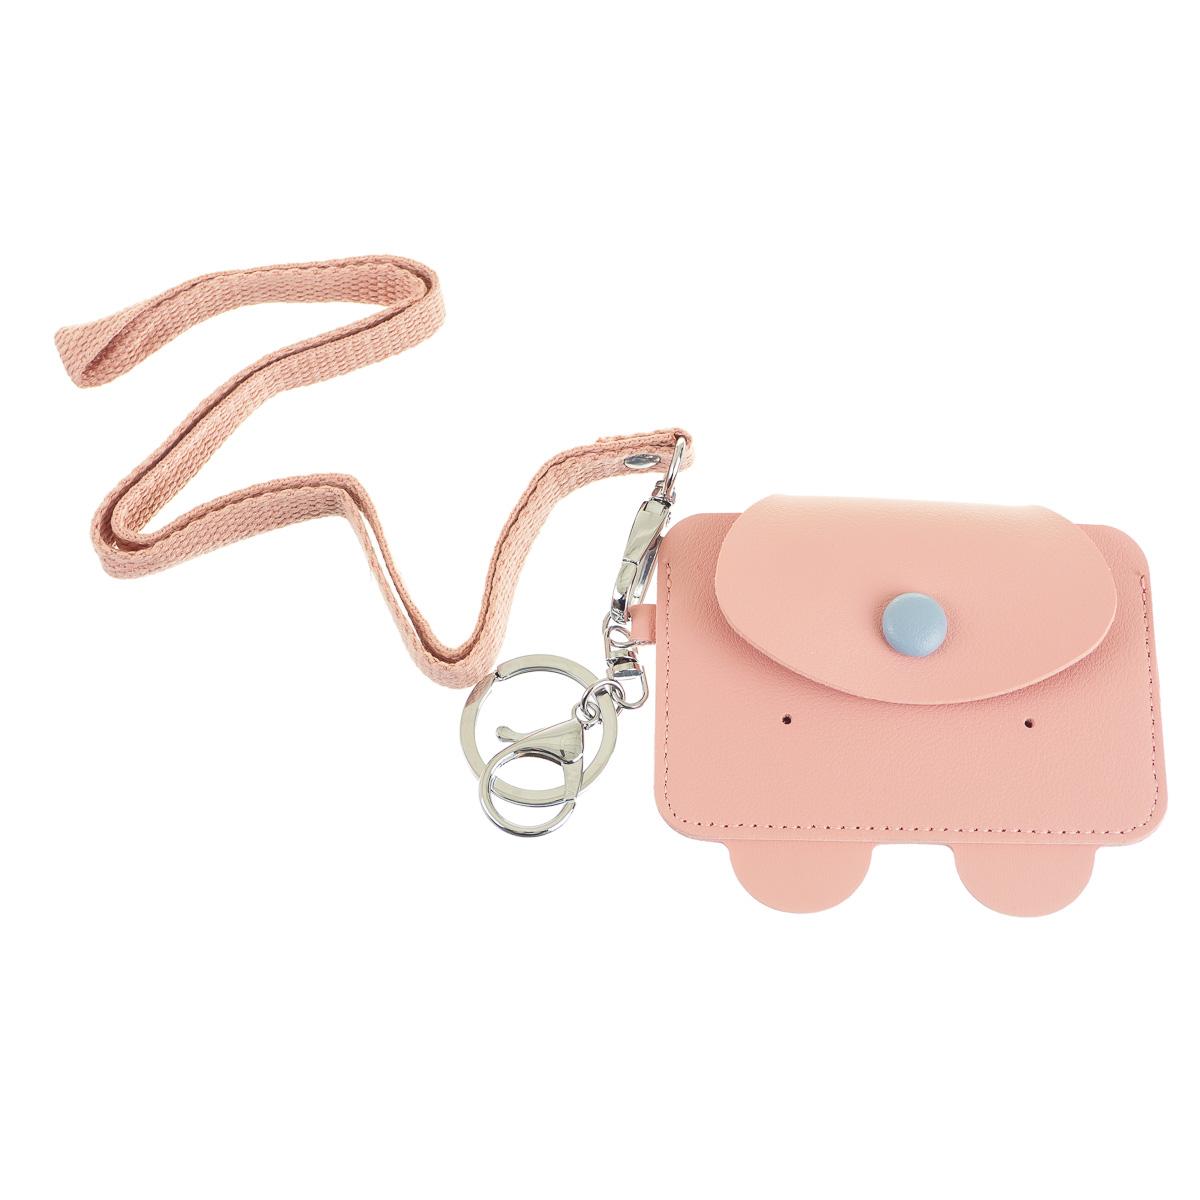 Картхолдер розовый в форме медведя